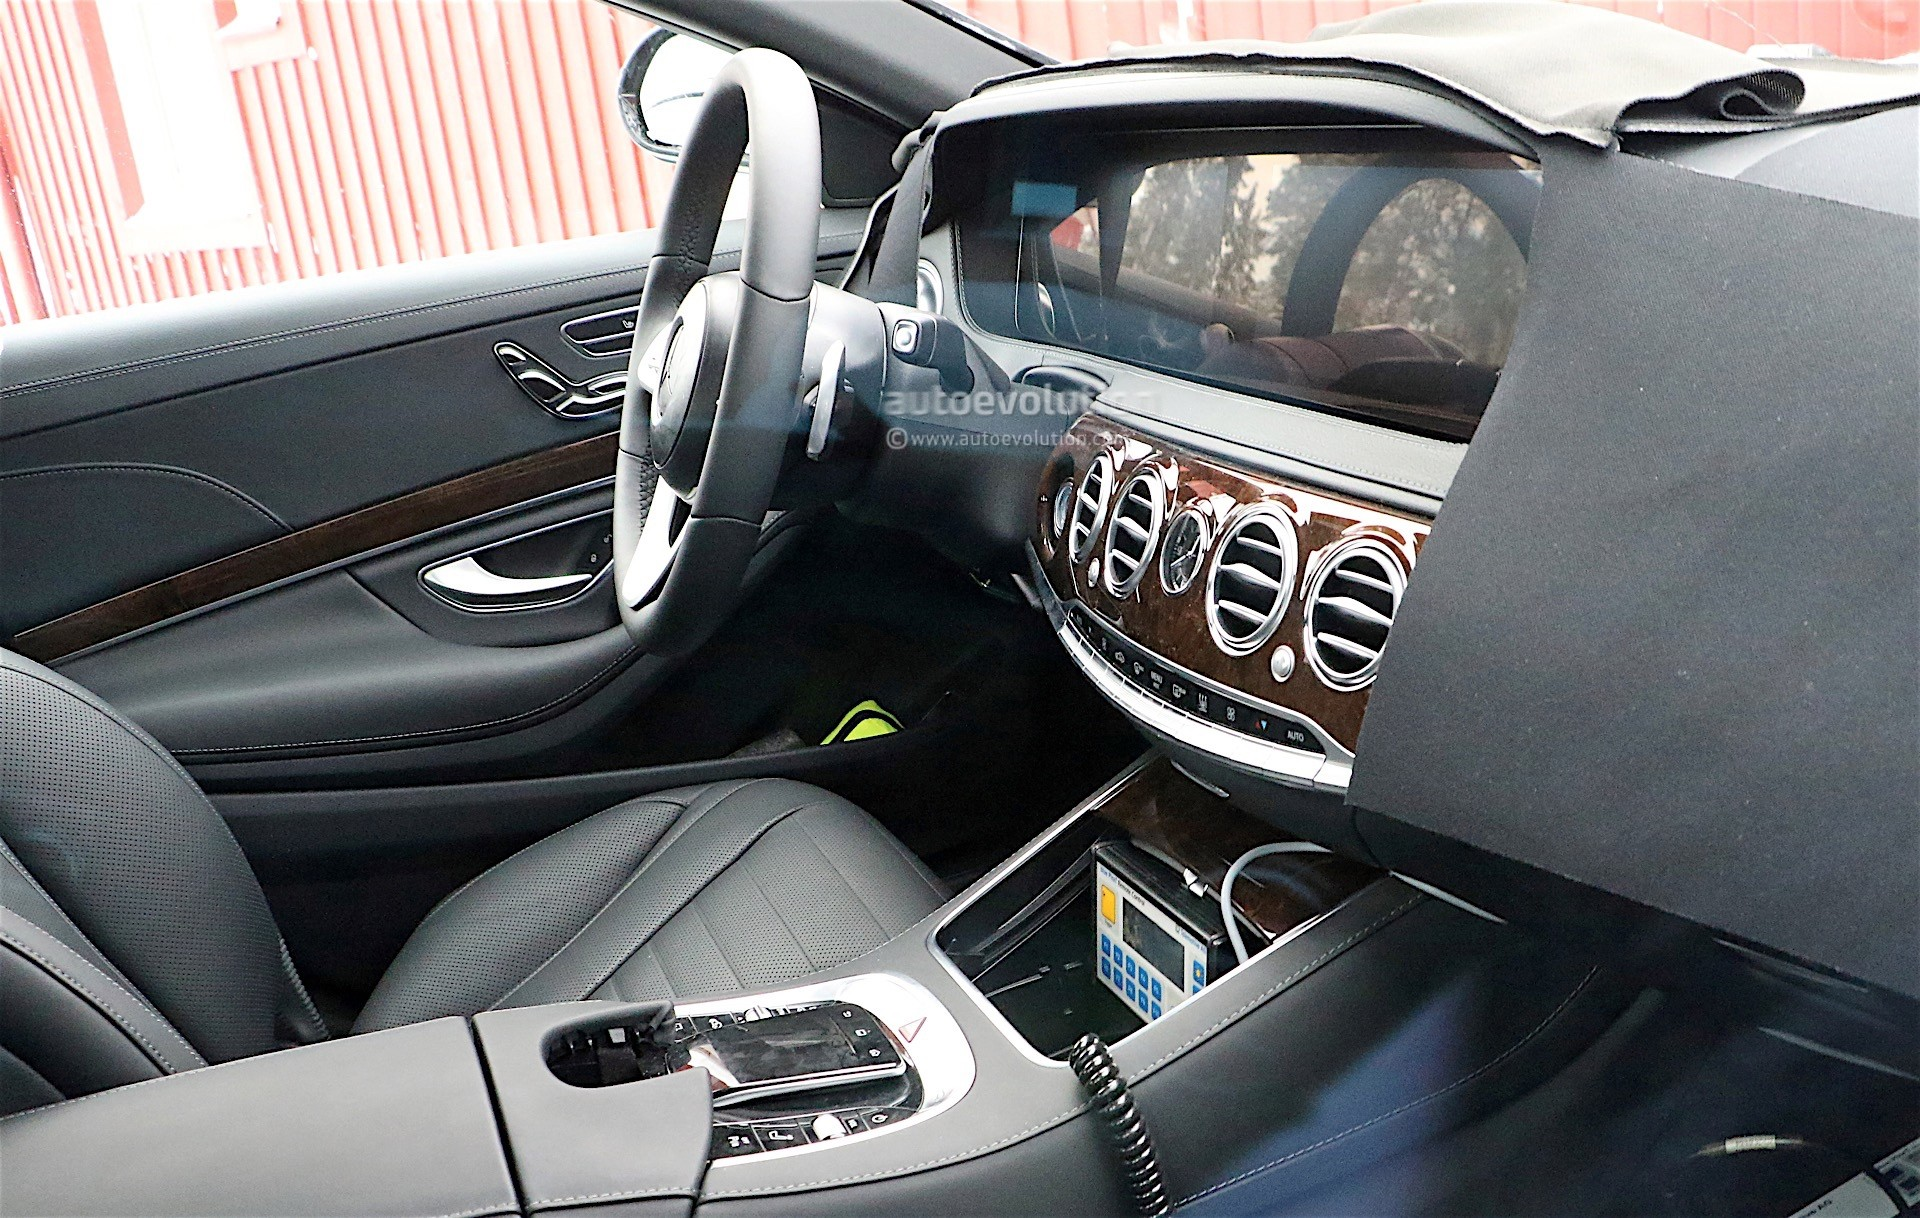 2018 mercedes benz s class facelift spyshots reveal new interior autoevolution. Black Bedroom Furniture Sets. Home Design Ideas